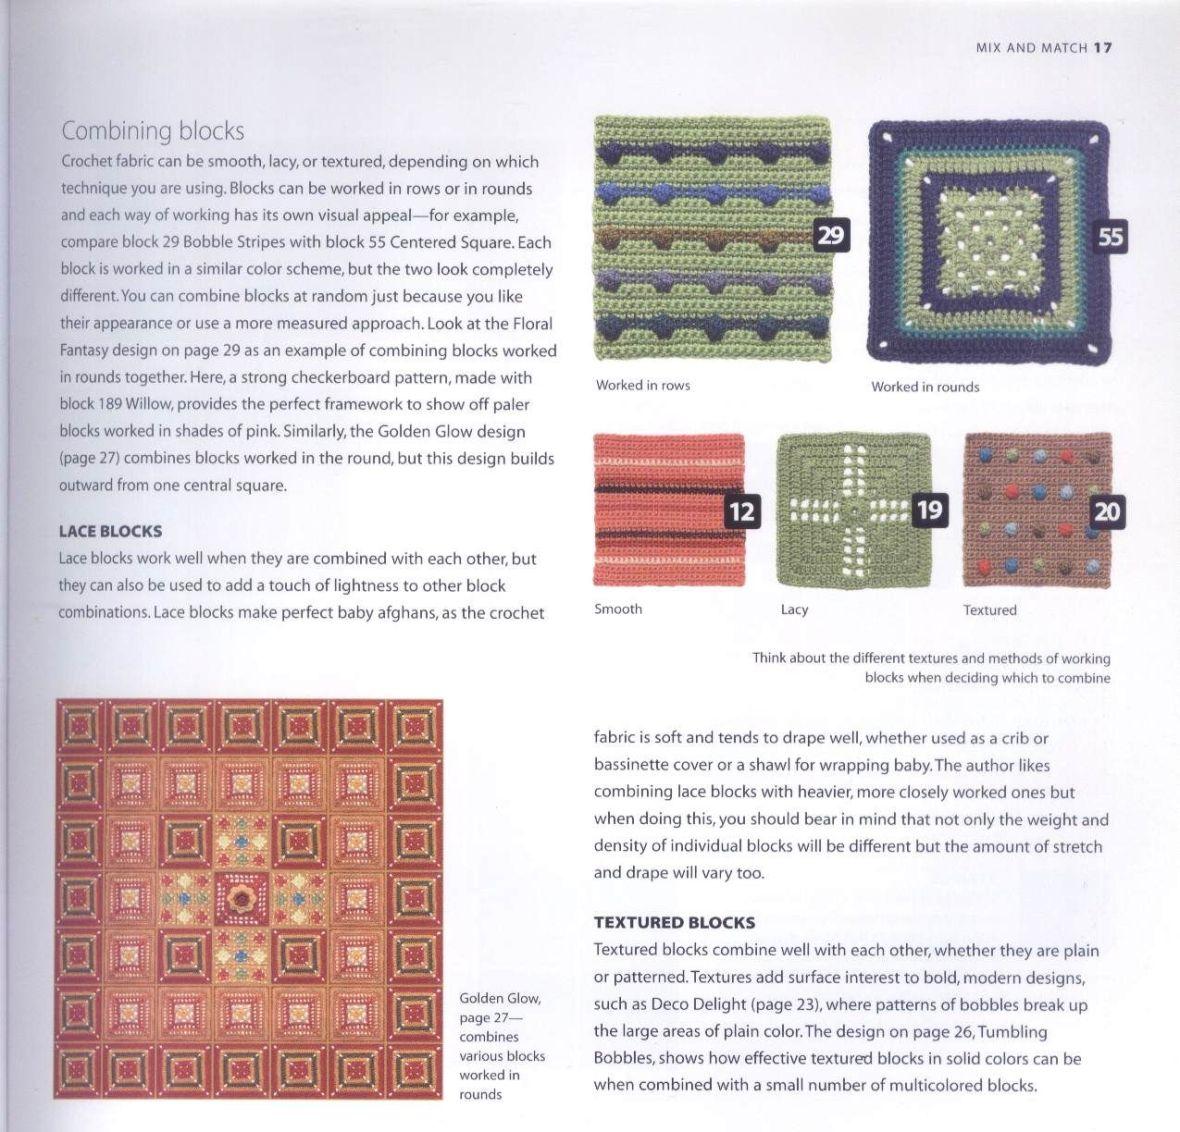 200 Crocheted Blocks for blankets, throws & Afghans 017